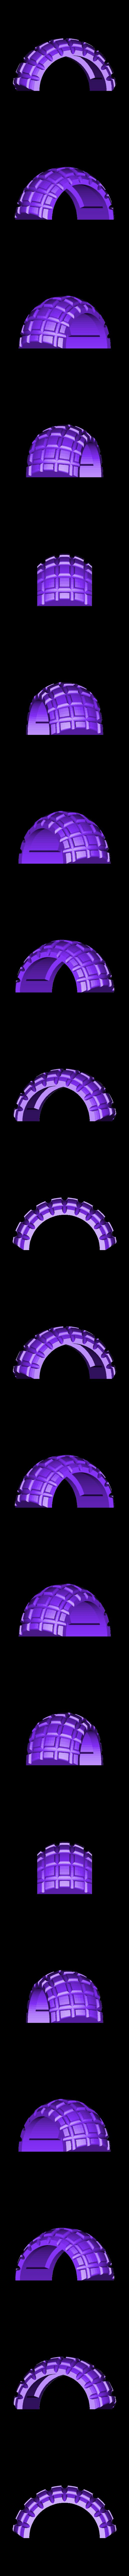 foot_rubber.stl Download free STL file RoboDog v1.0 • 3D printing object, robolab19